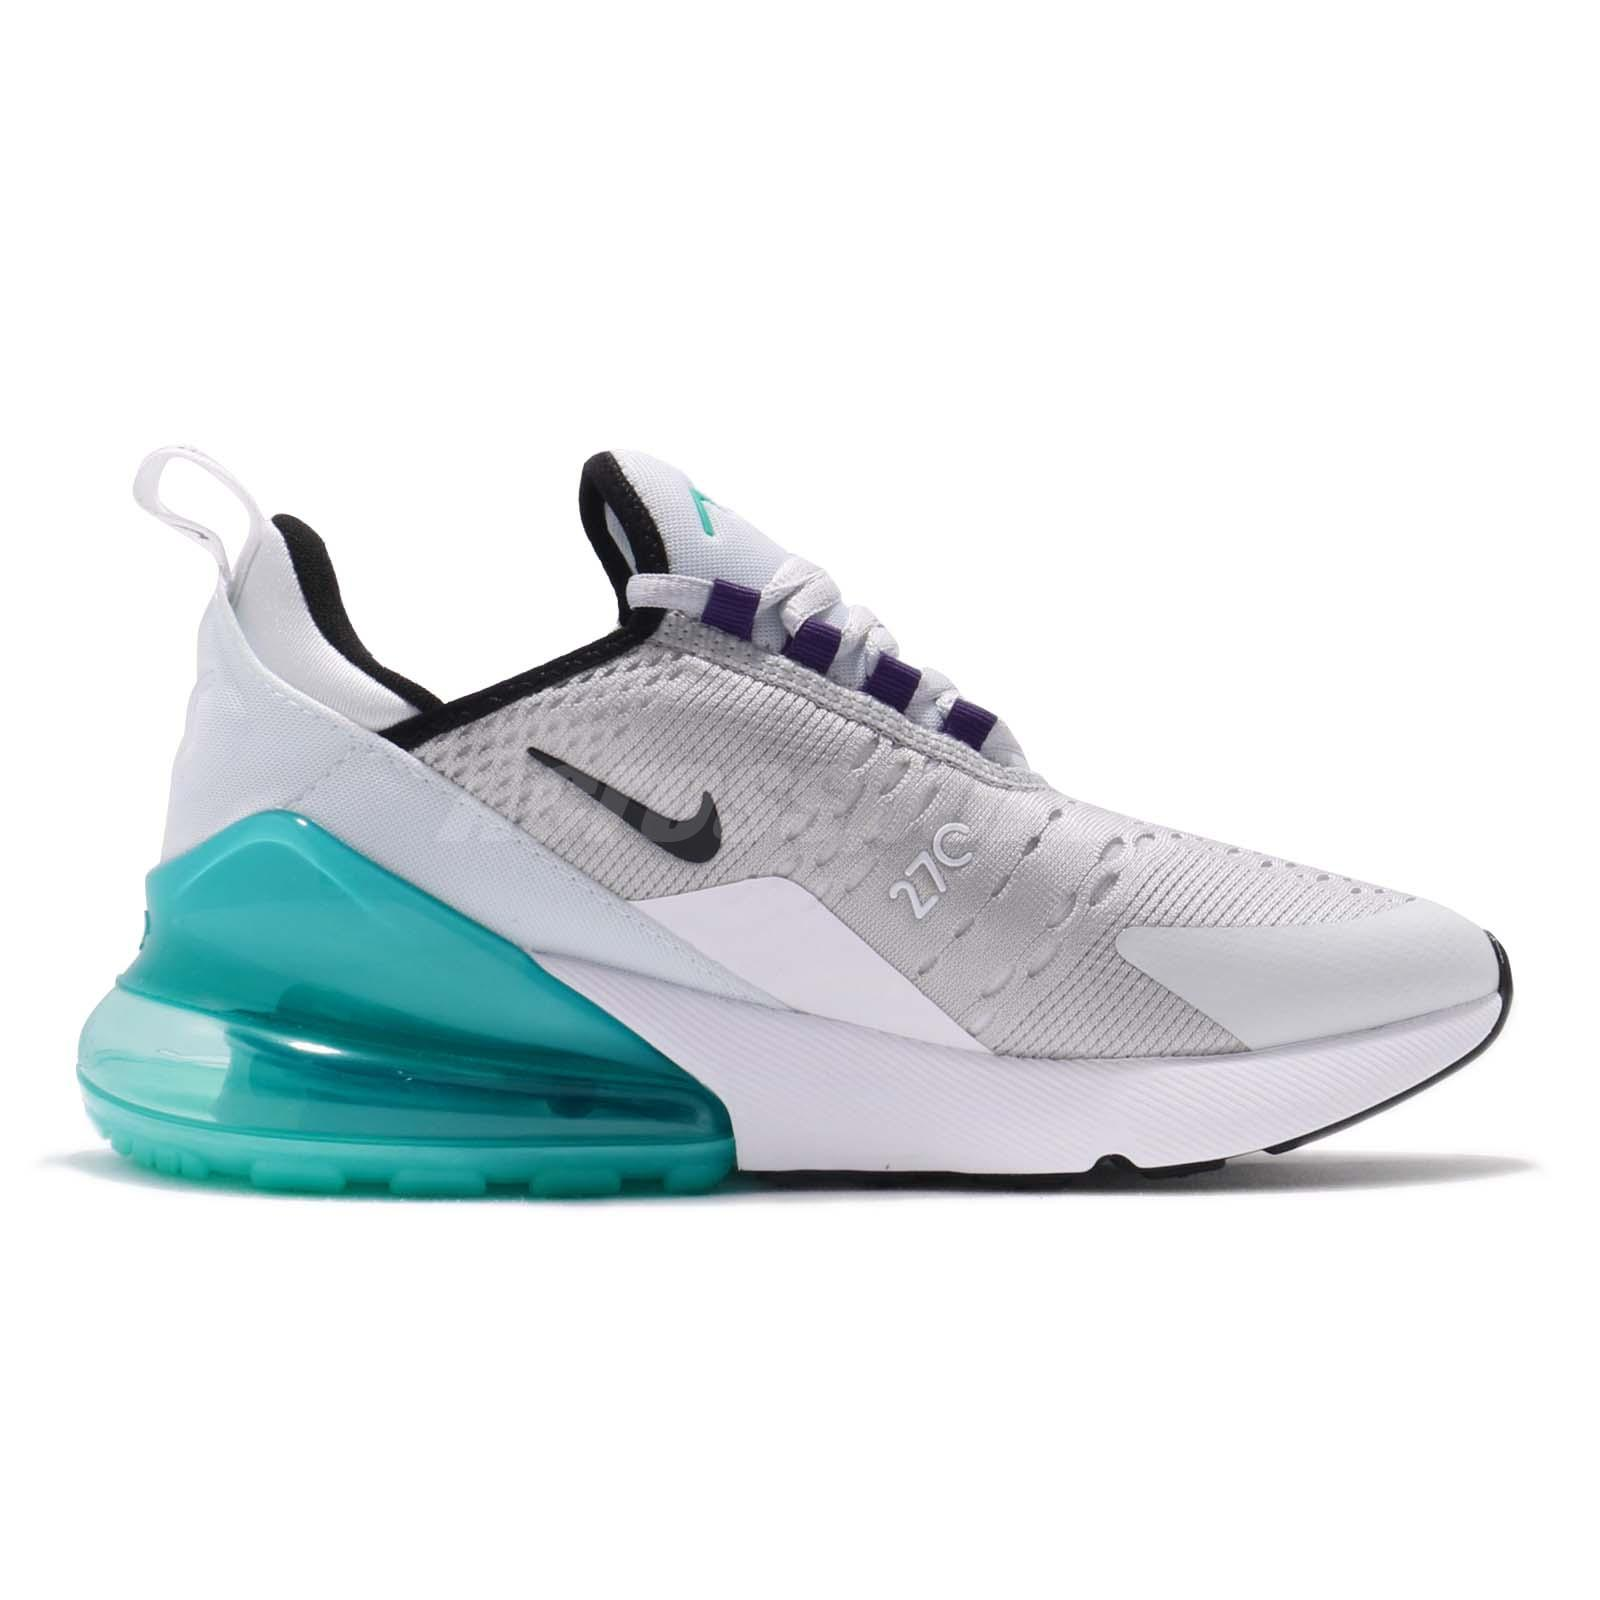 e0993f3374c2 Nike Air Max 270 GS Pure Platinum Hyper Jade Kid Women Running Shoes ...